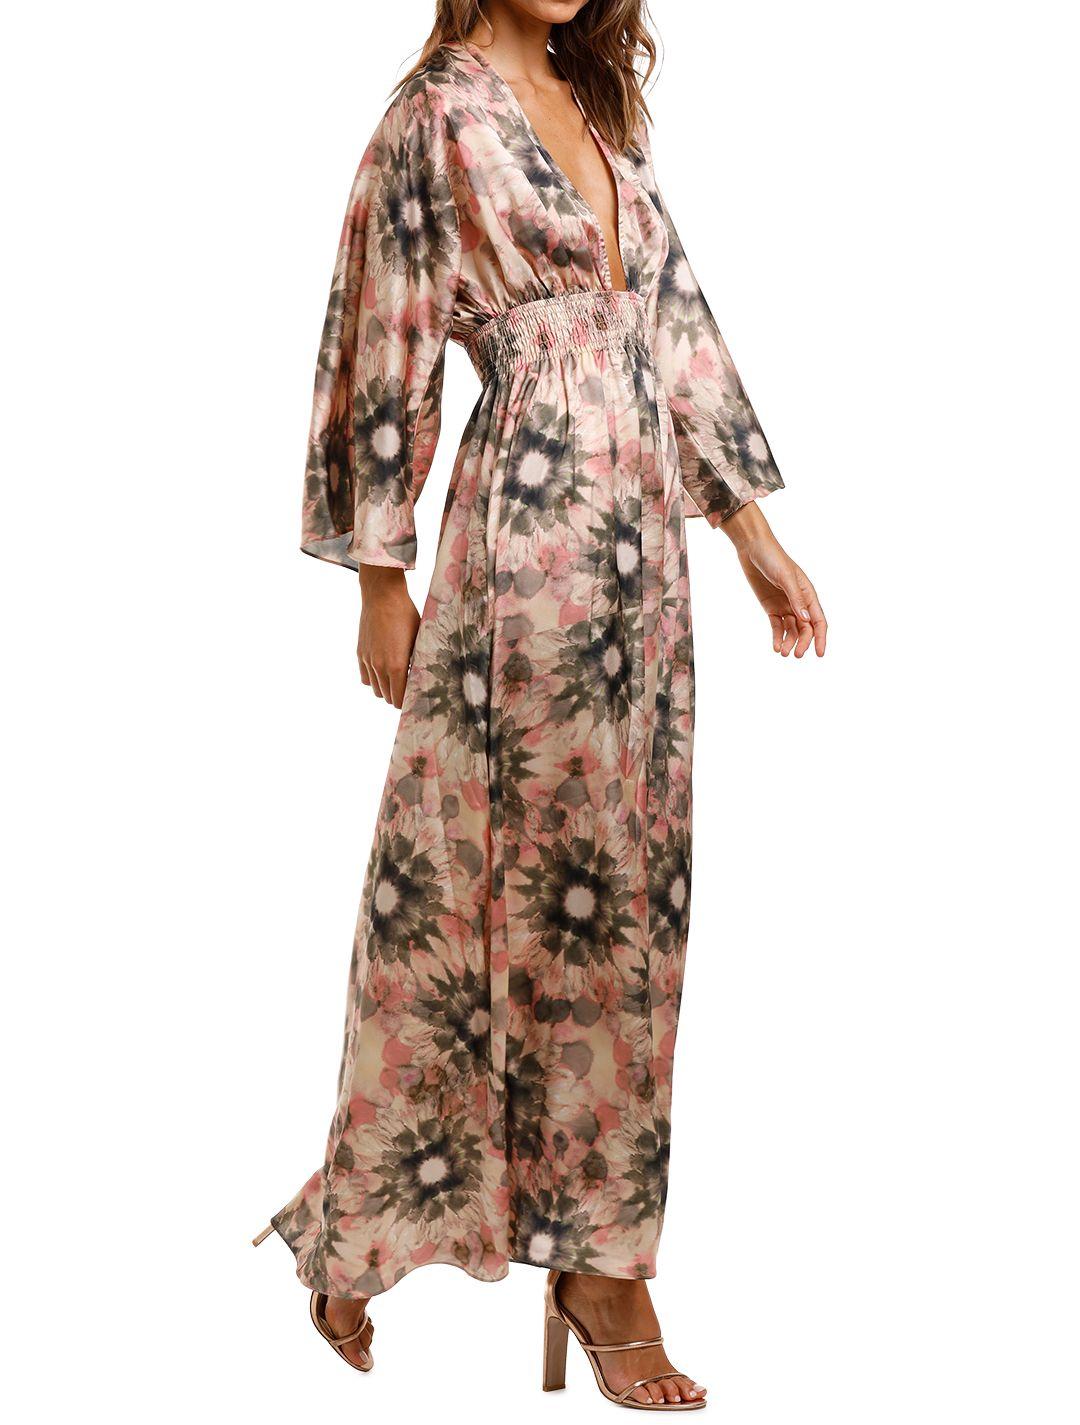 Misa LA Bardot Dress Maxi